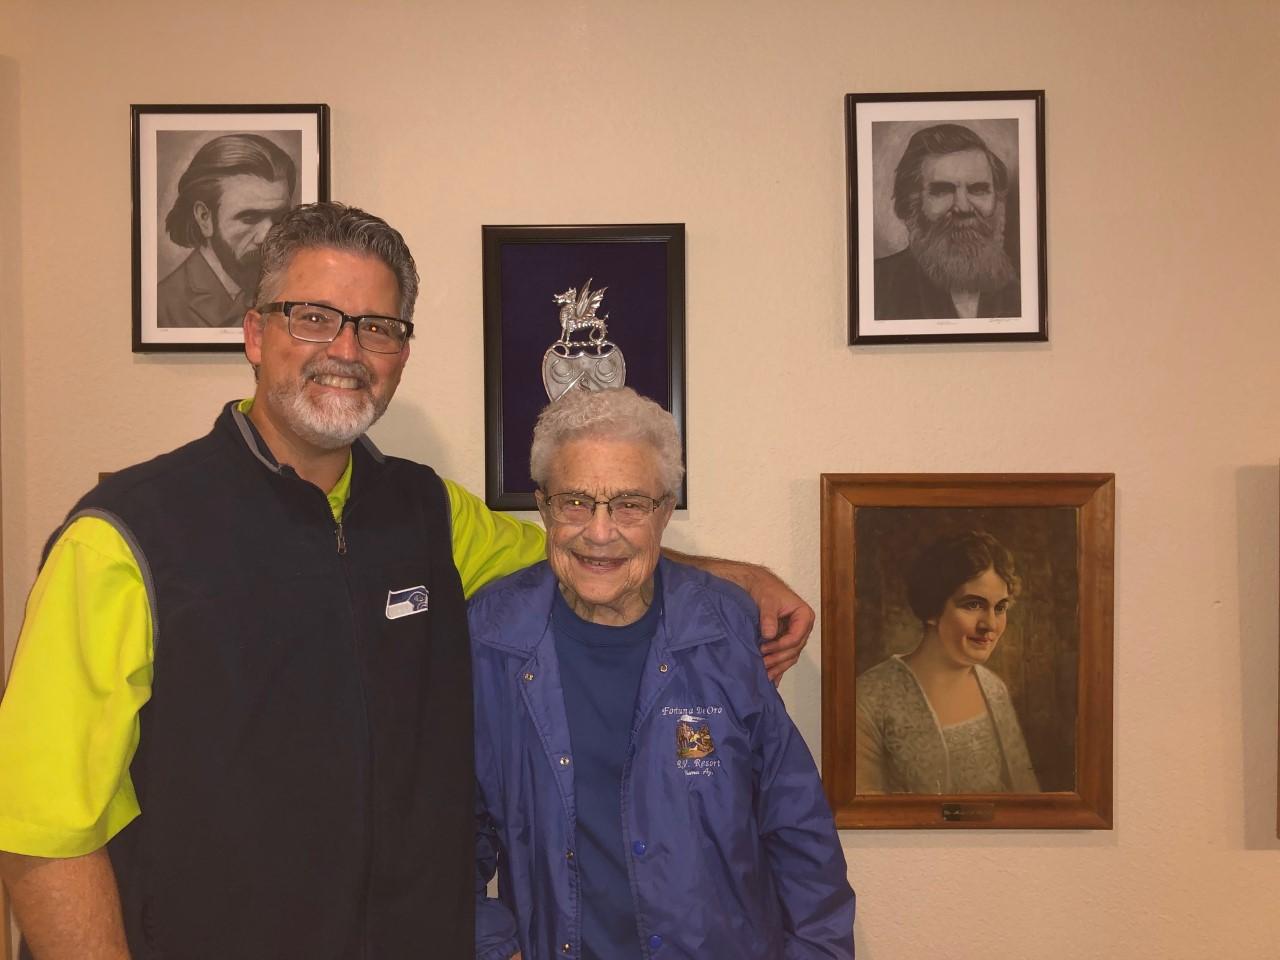 Norma Celebrates 85 years of Chiropratic!